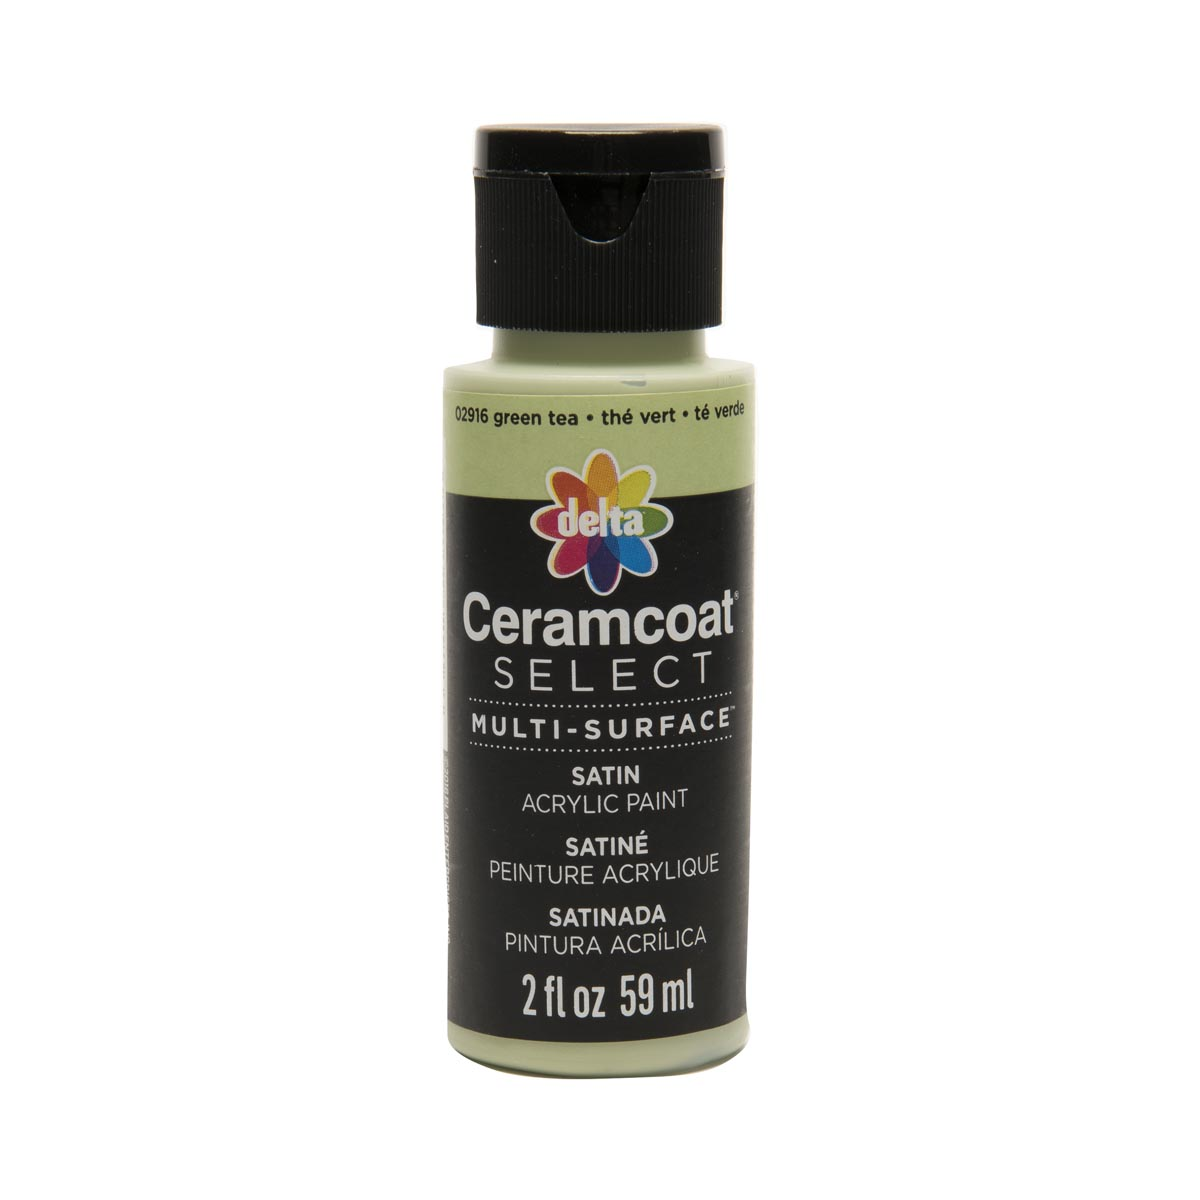 Delta Ceramcoat ® Select Multi-Surface Acrylic Paint - Satin - Green Tea, 2 oz. - 02916